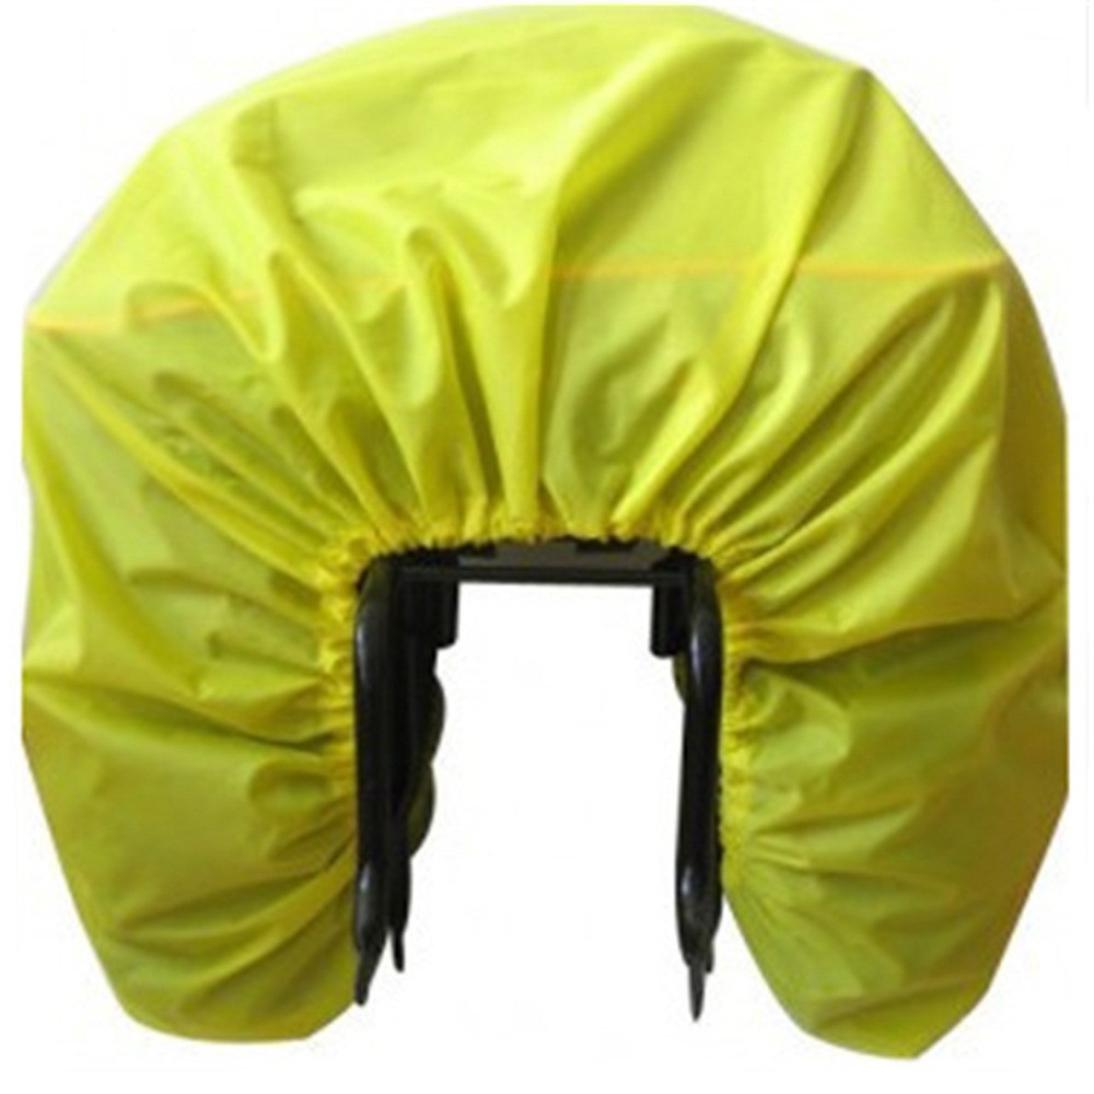 Hunpta Reflective Waterproof Cover Bicycle Bike Rack Pack Bag Dust Rain Cover